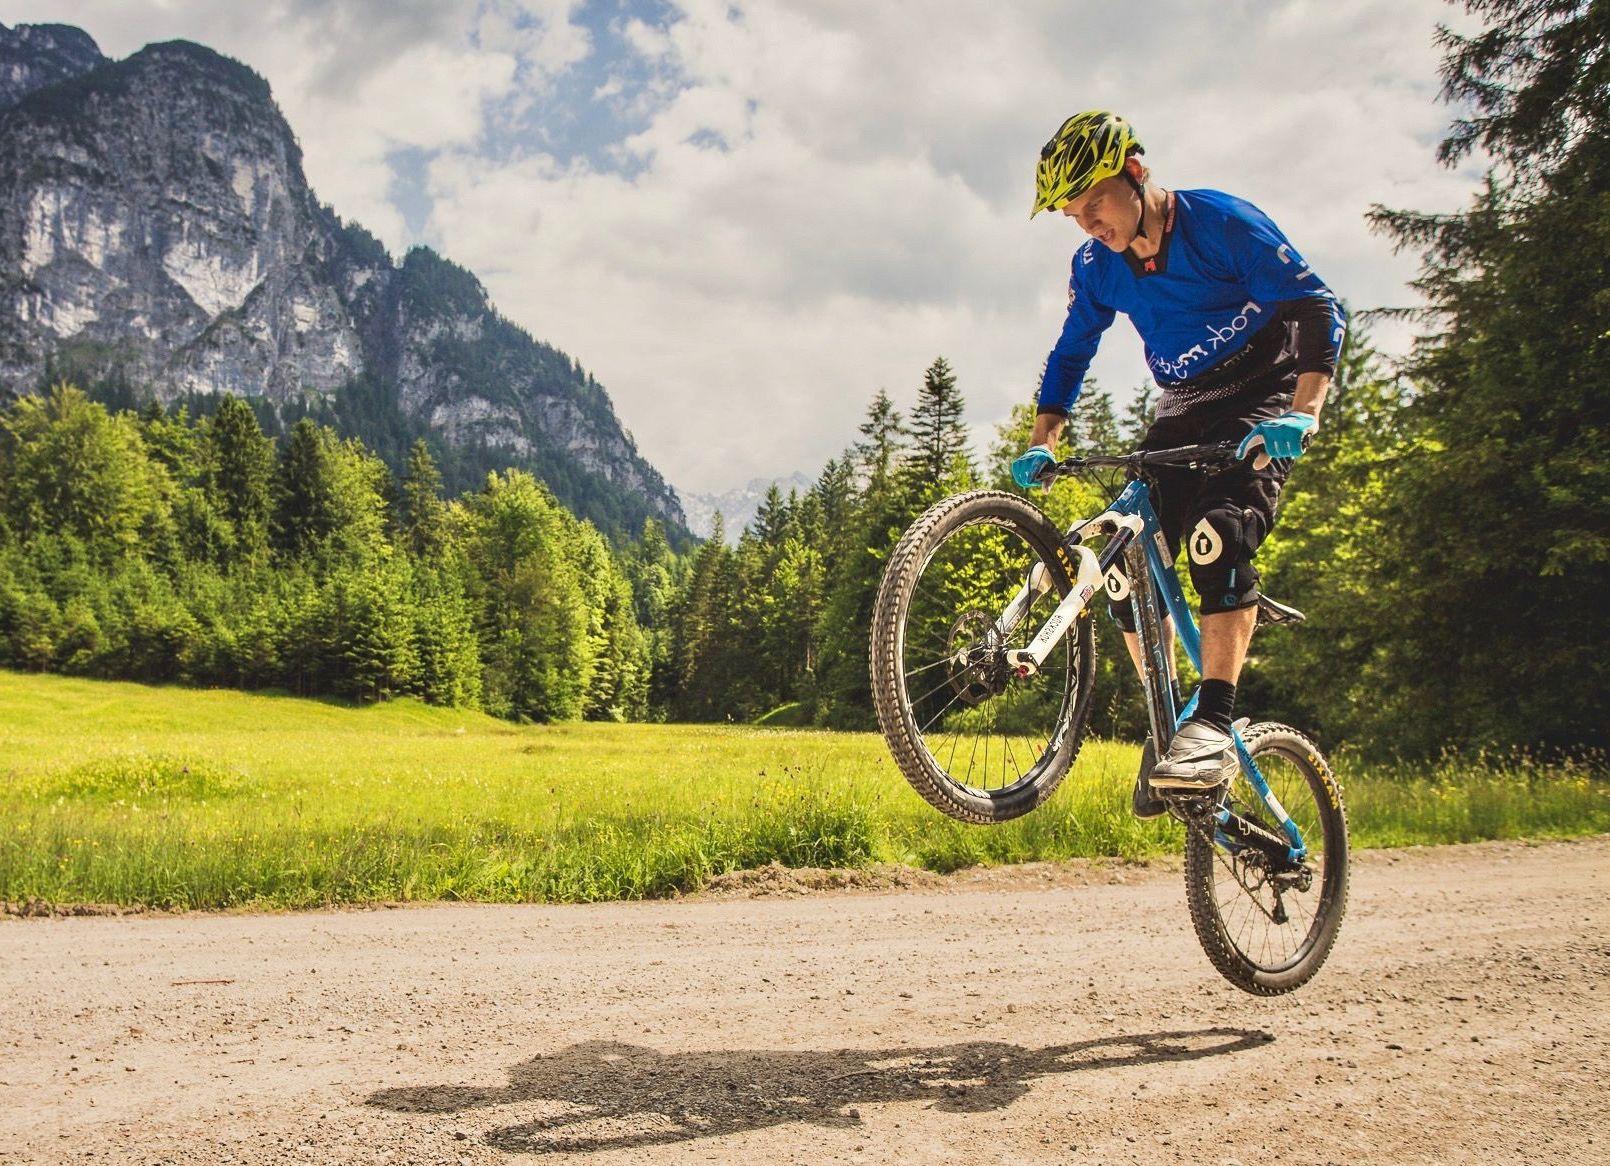 Experten Fahrtechnik Kurs in Koblenz - Rock my Trail MTB und eBike Bikeschule